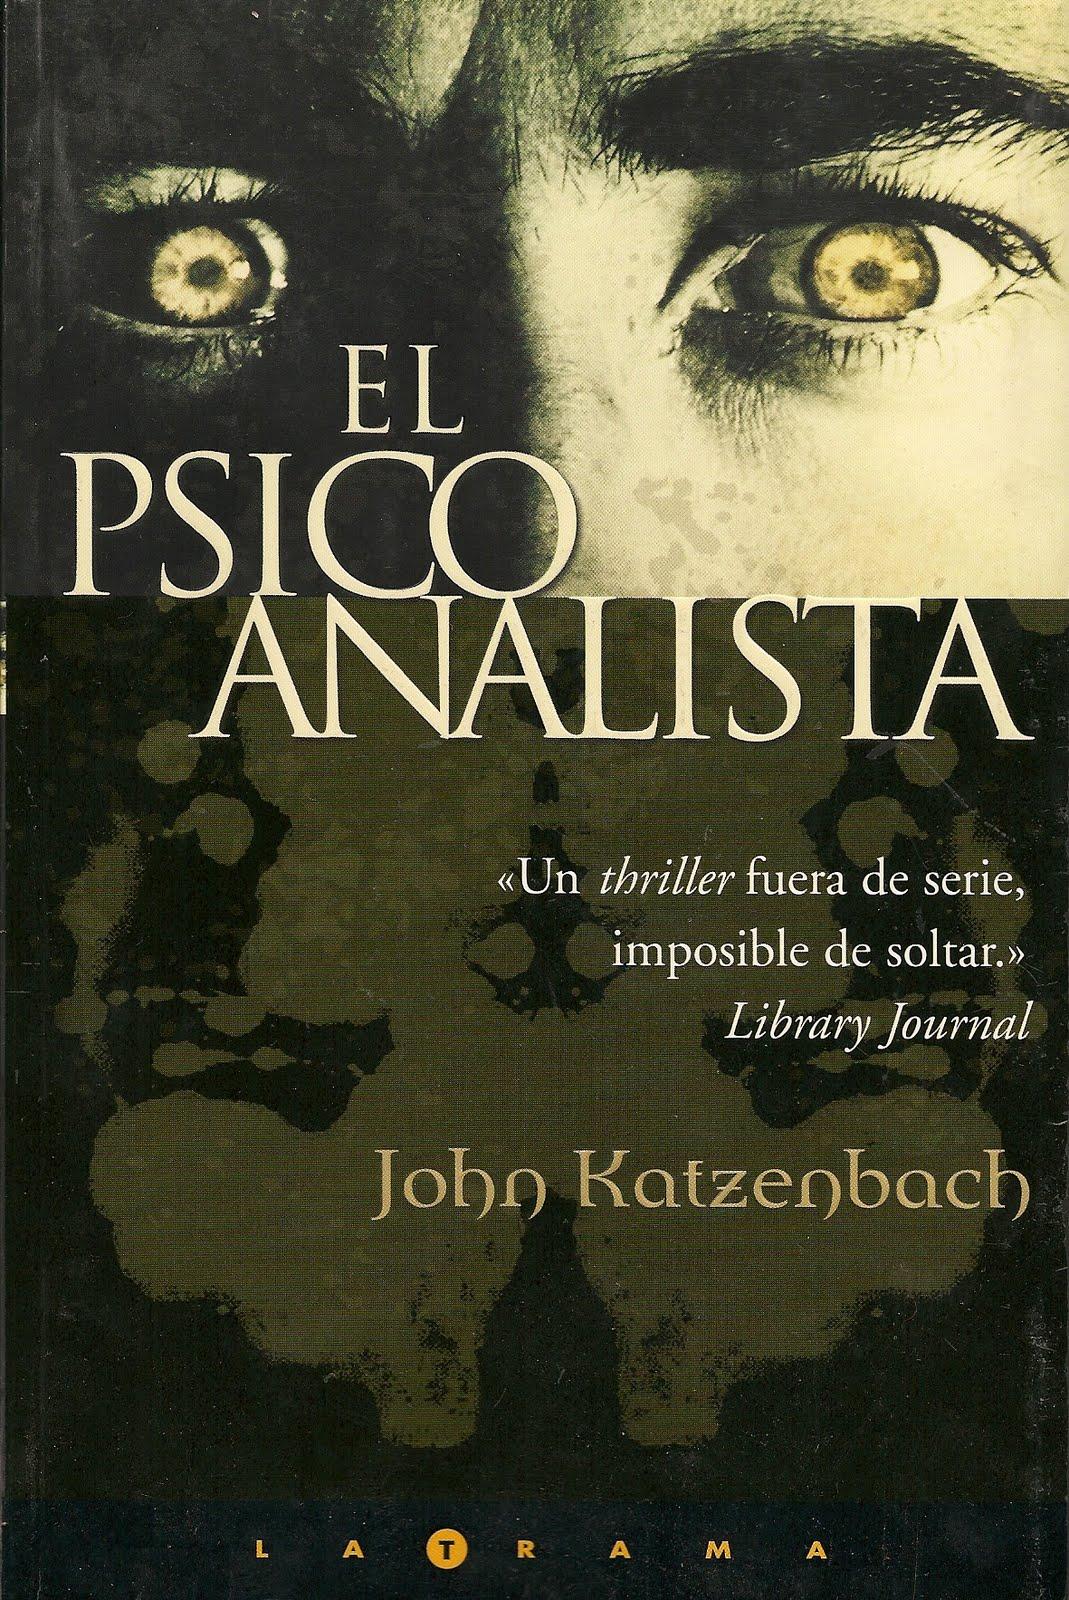 La Chaiza: Libros Leídos XXXVII: El Psicoanalista... @tataya.com.mx